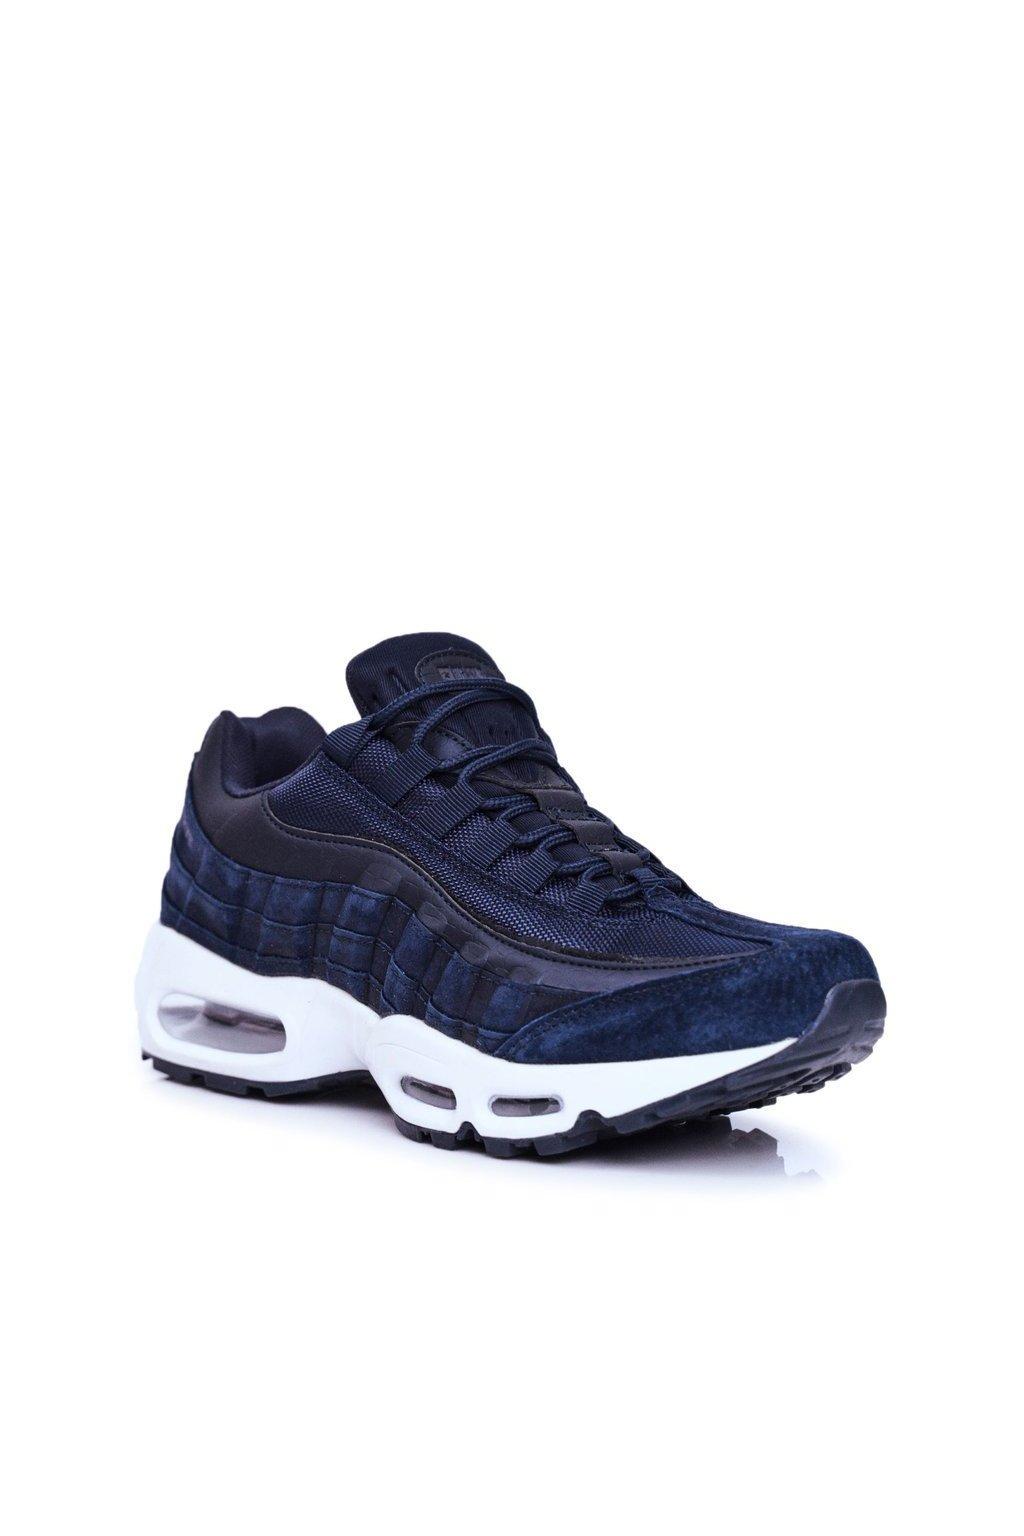 Modrá obuv NJSK FF174299 NAVY